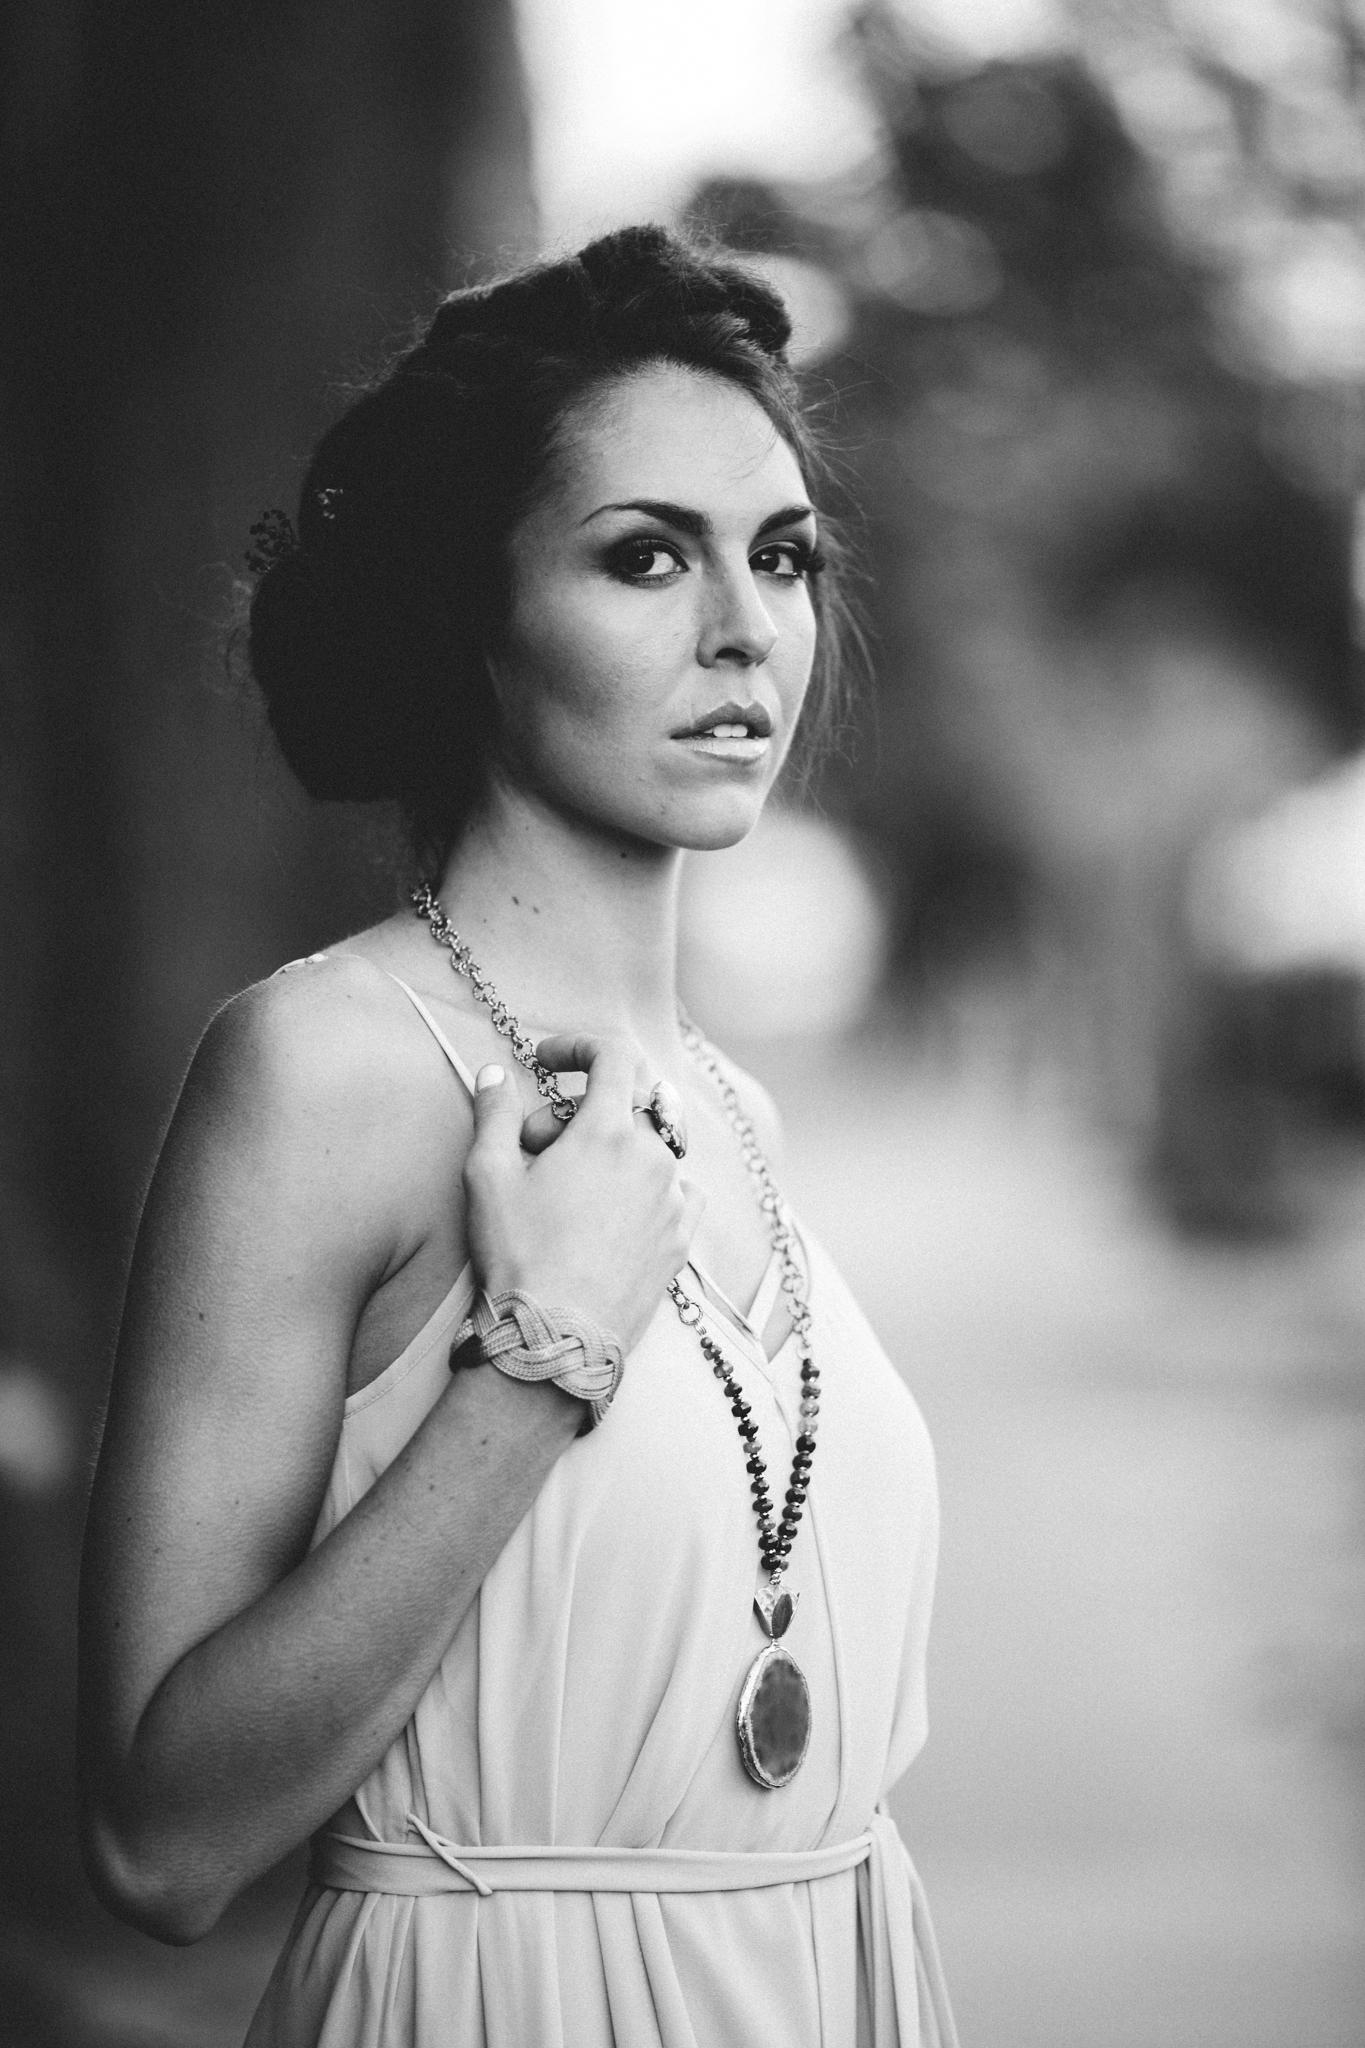 denver fashion photography (40 of 54)